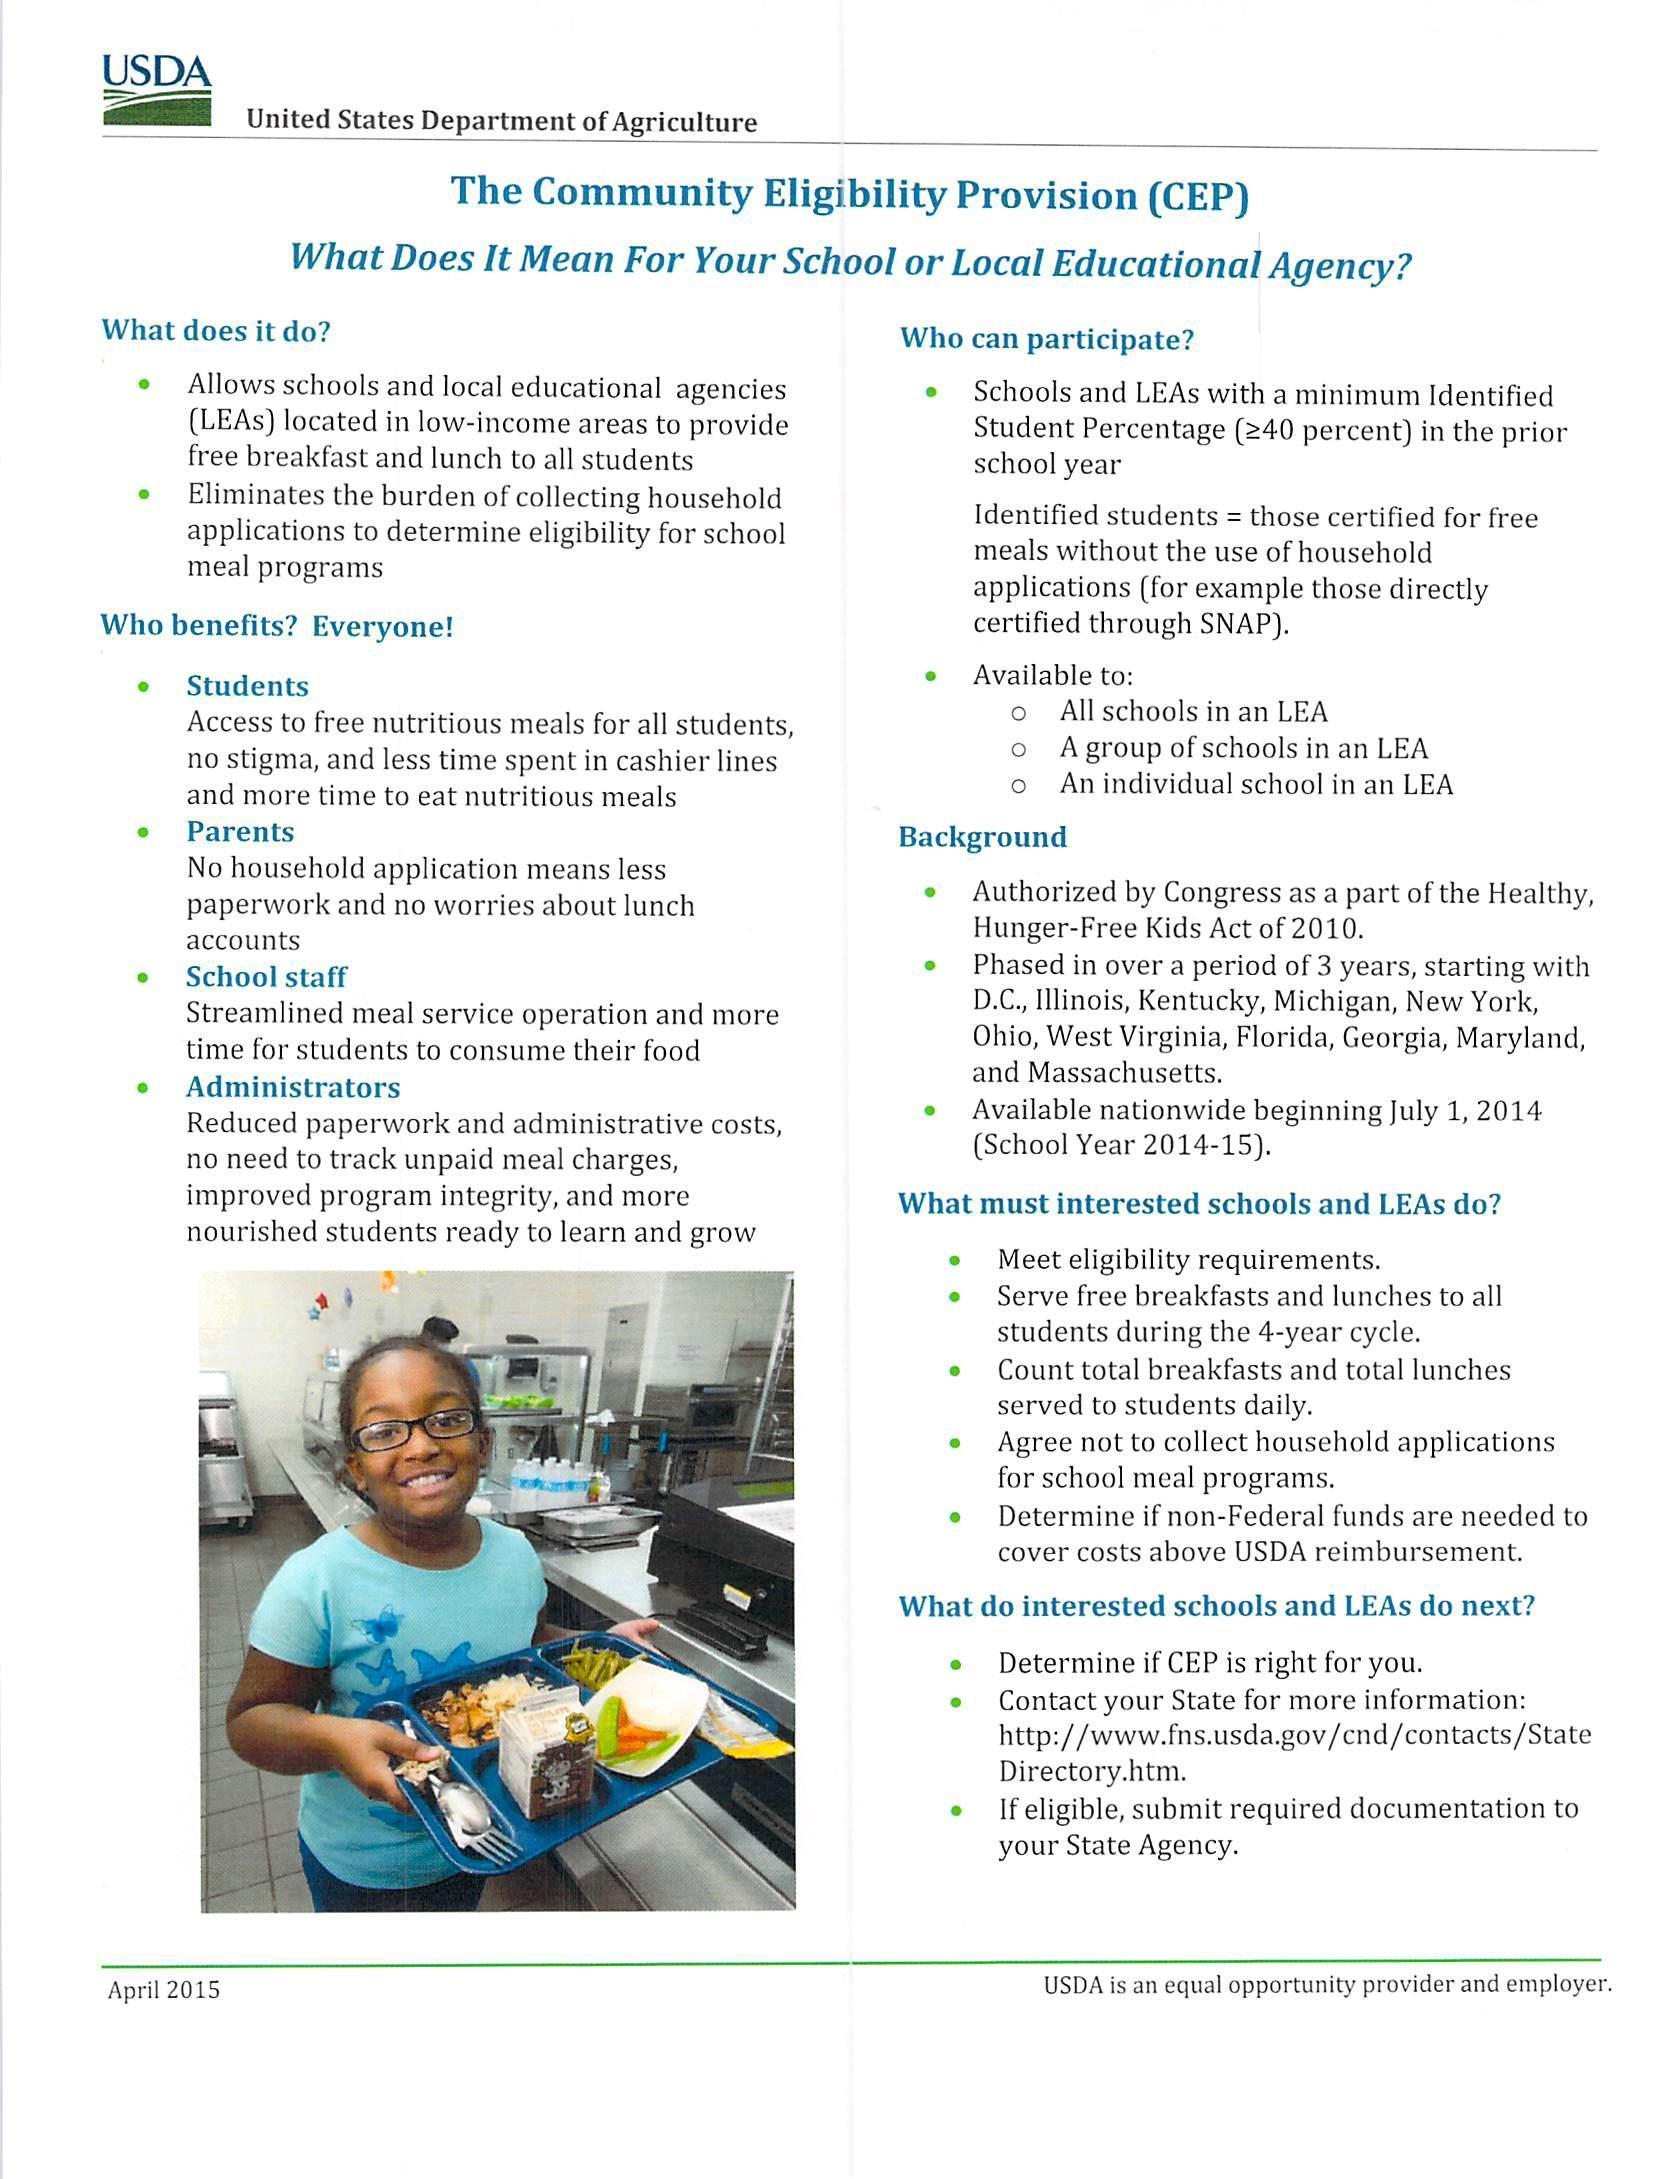 CEP Fact Sheet